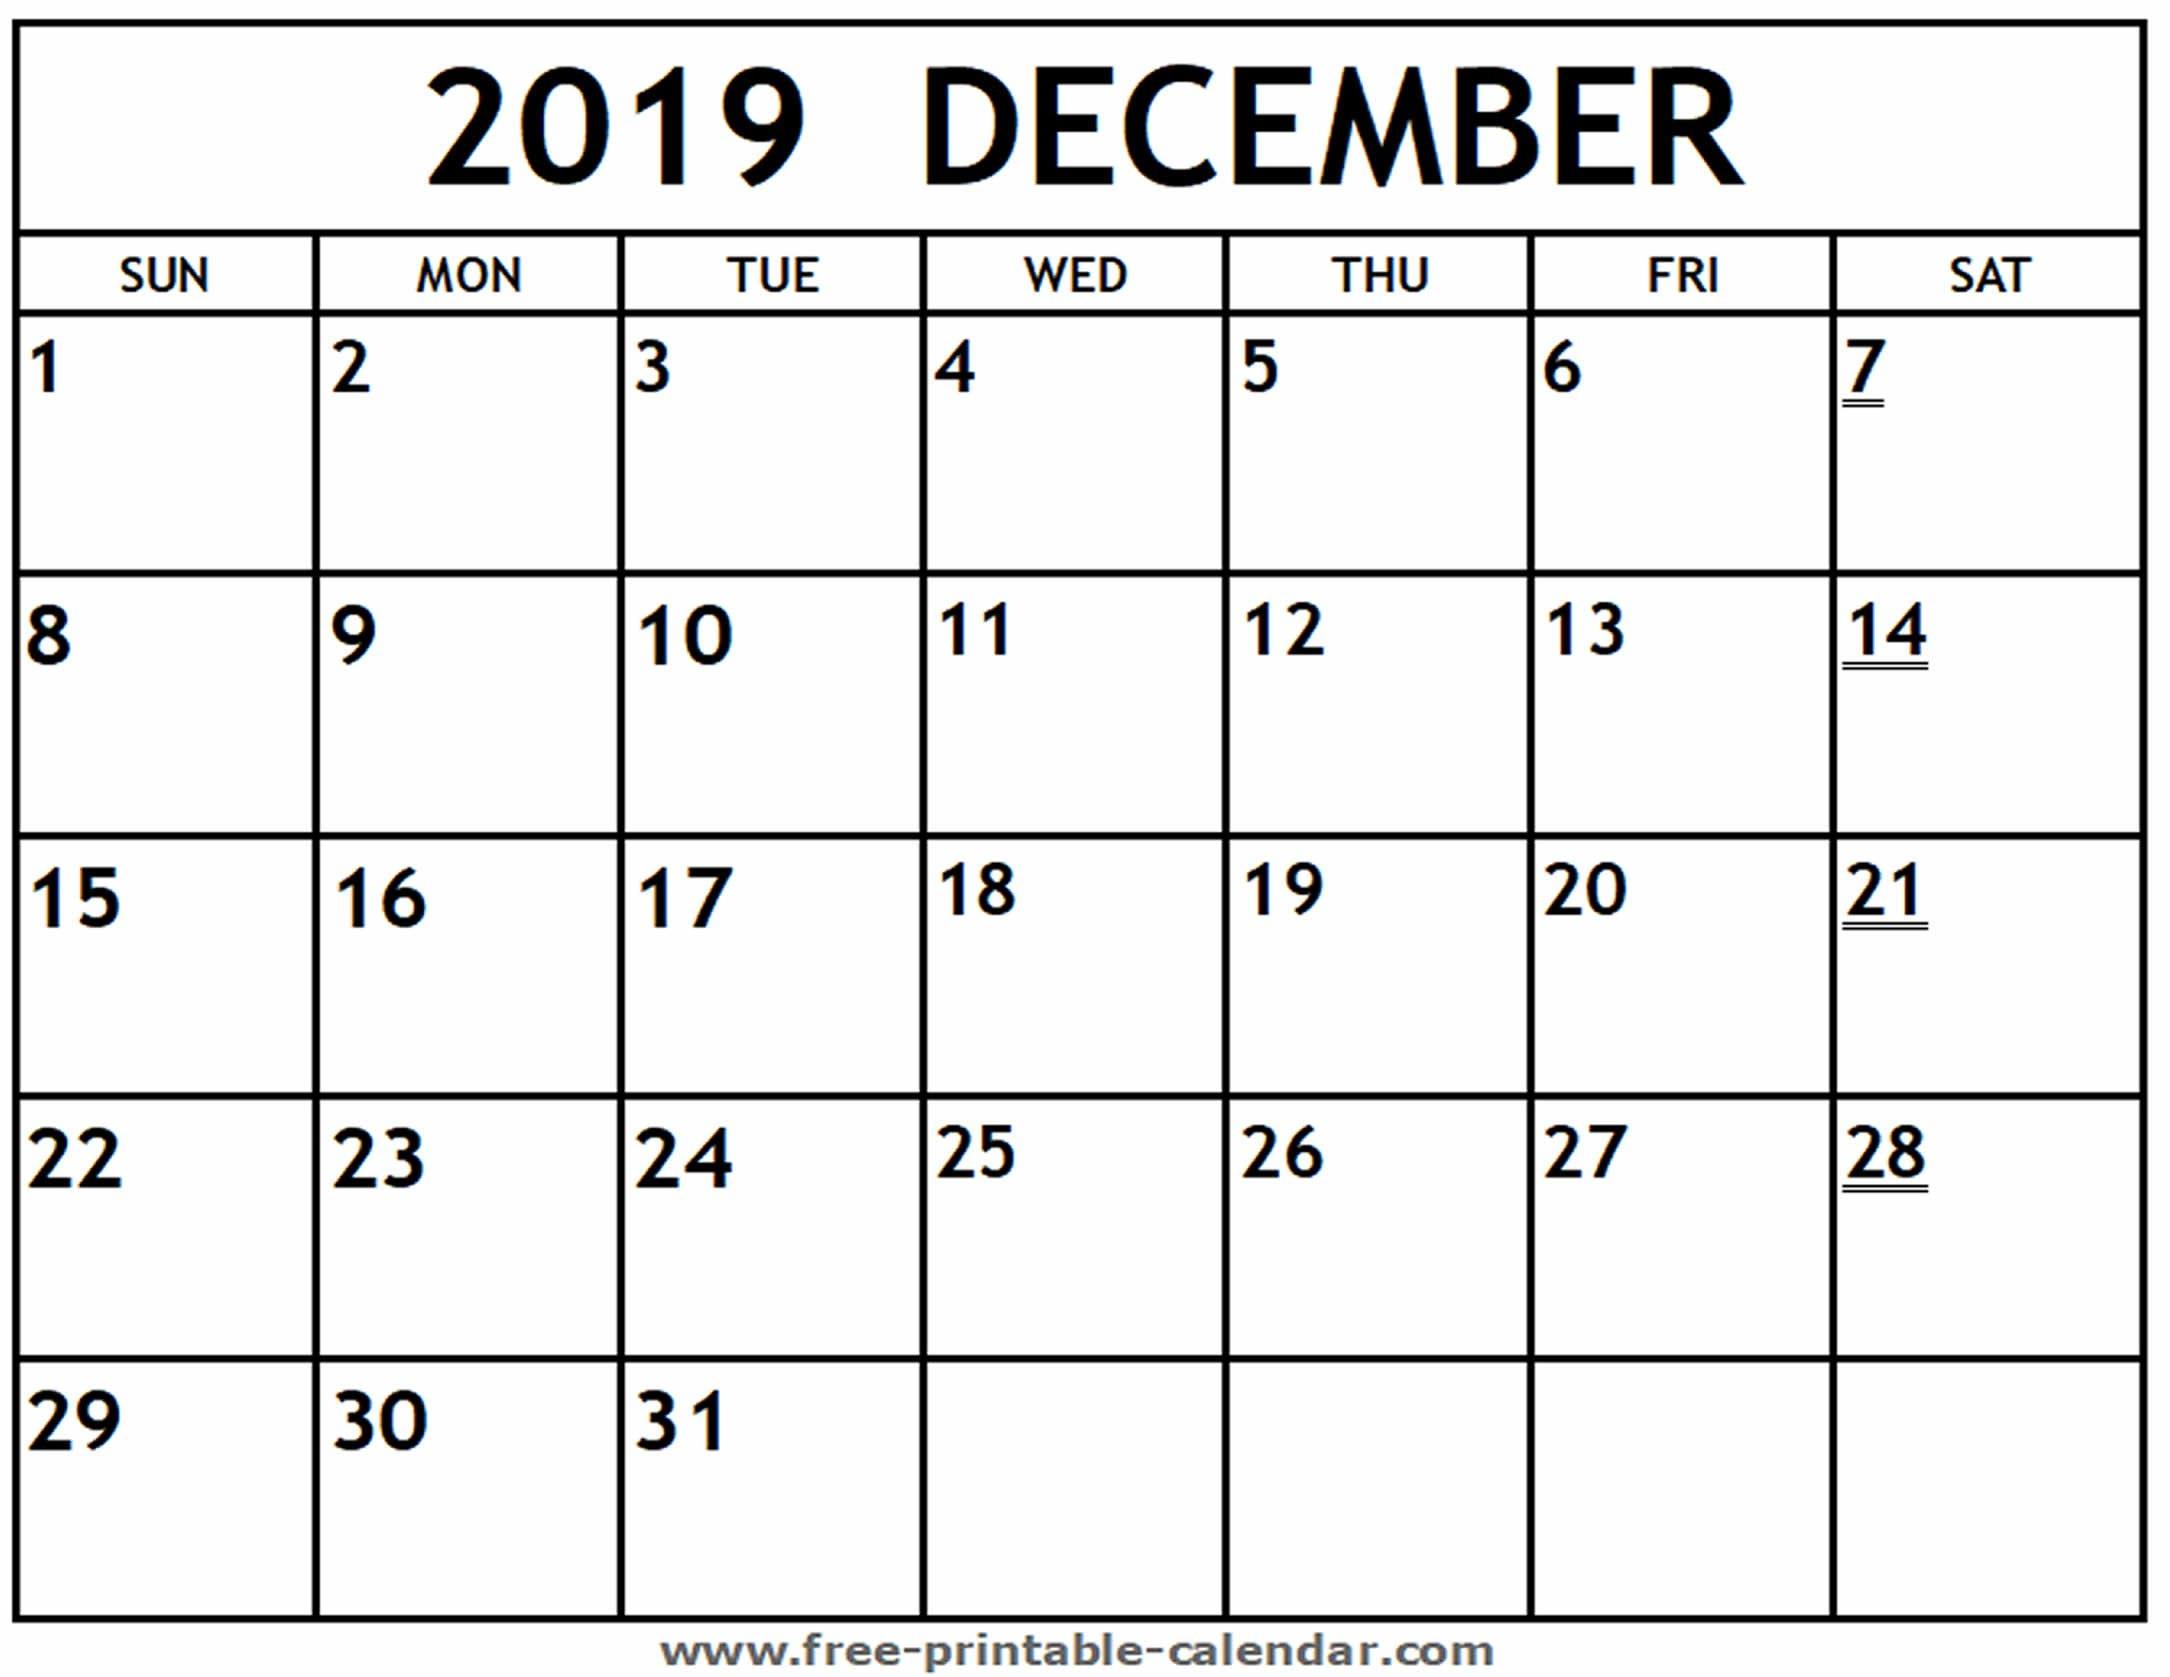 Printable 2019 December Calendar – Free Printable Calendar Calendar 2019 December Printable